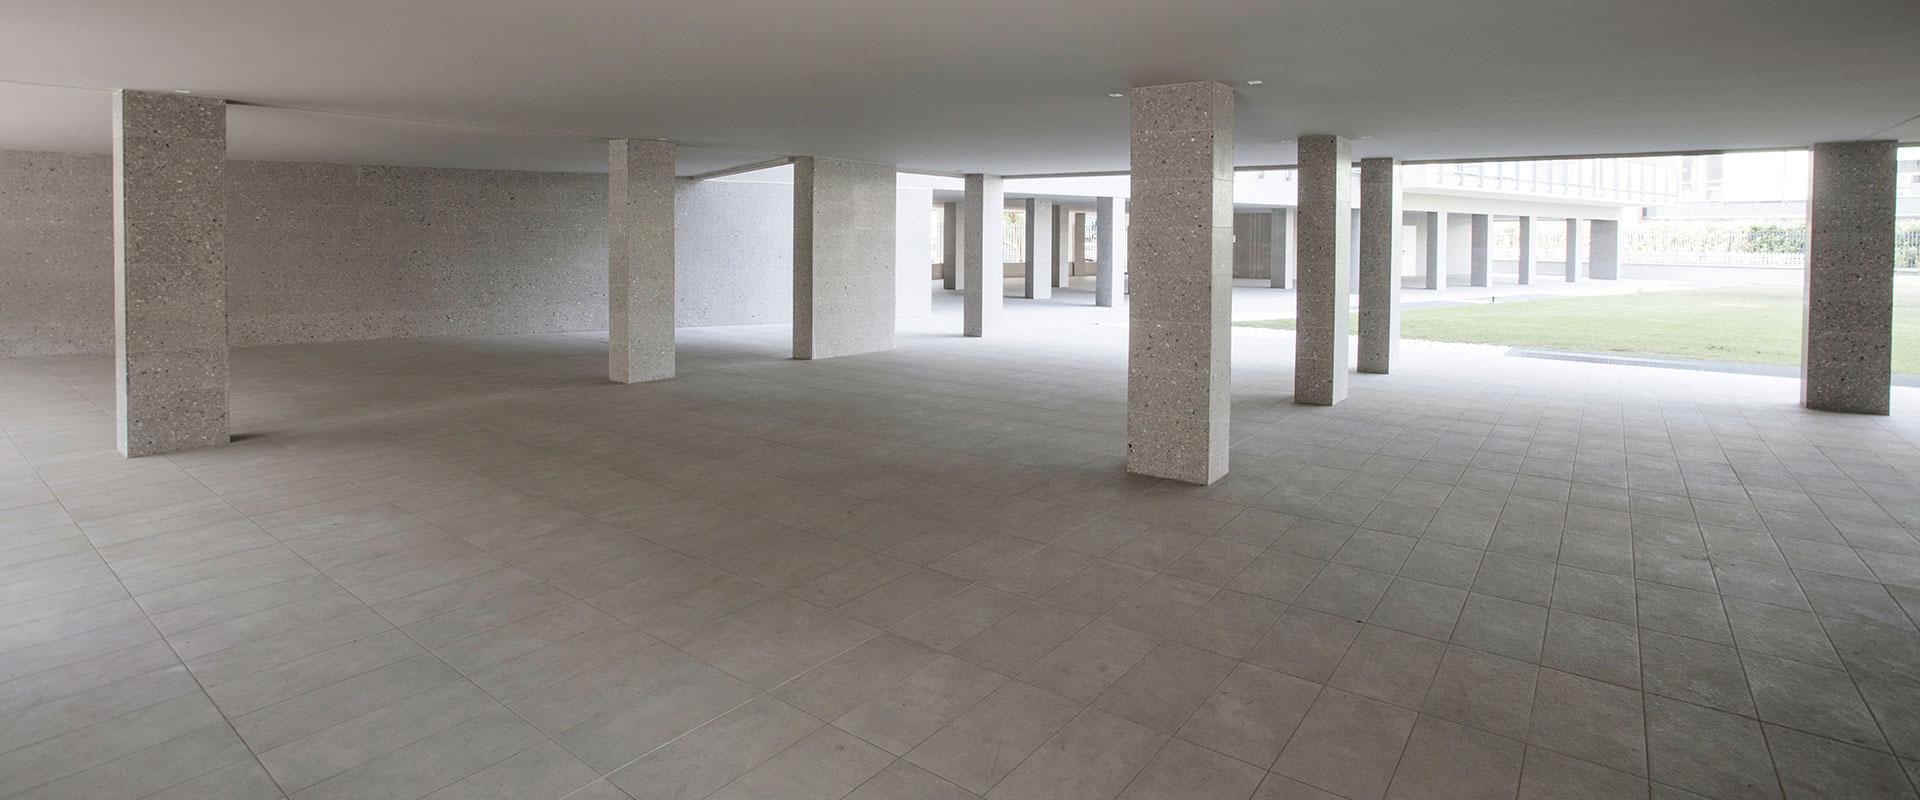 AGGLOTECH-progetto-santorre-santarosa-slider-3